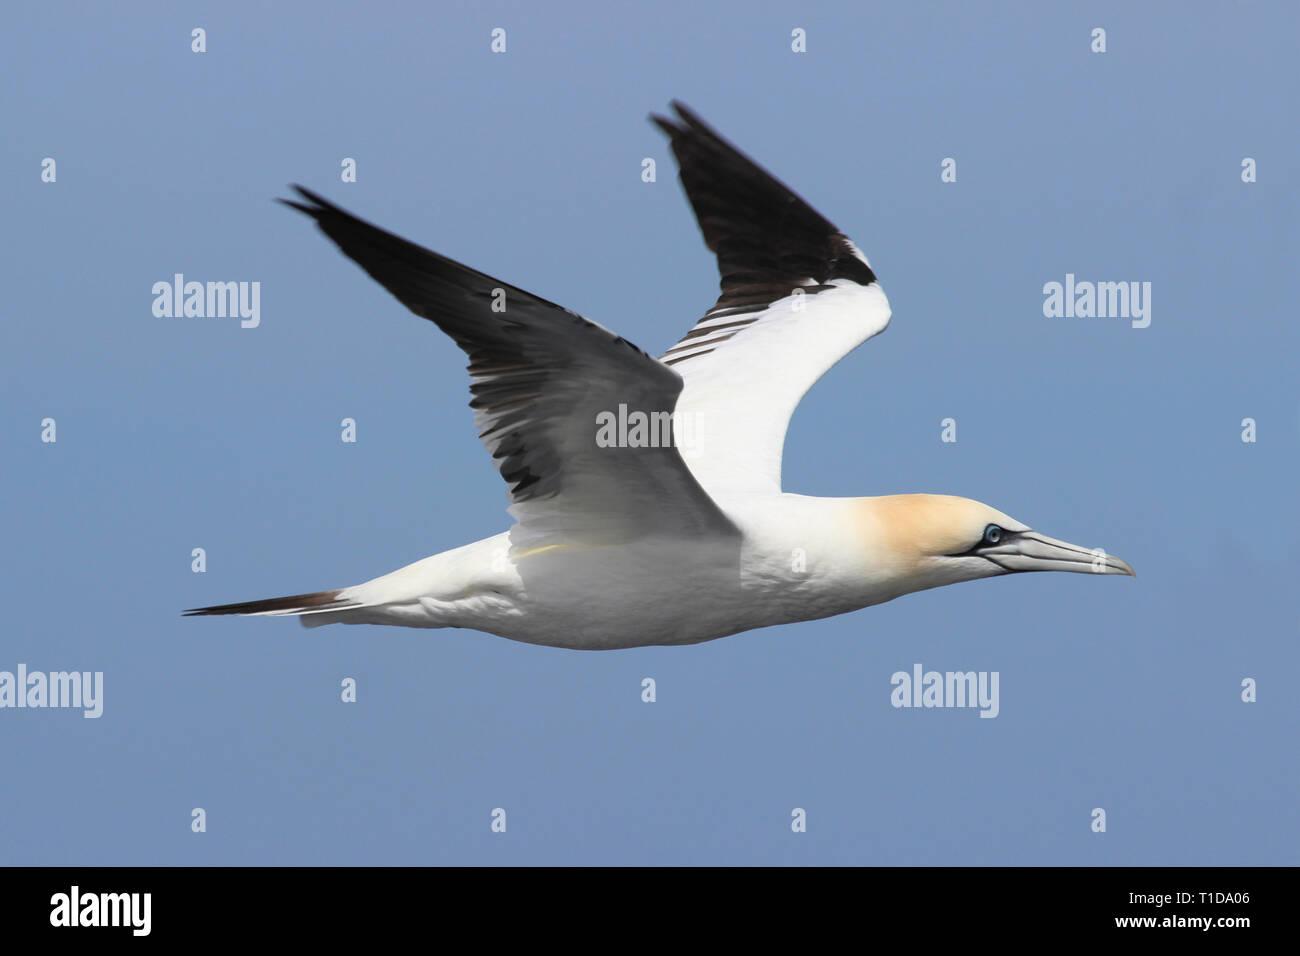 Northern Gannet Morus bassanus In Flight, Rockall Trough, Atlantic Ocean - Stock Image